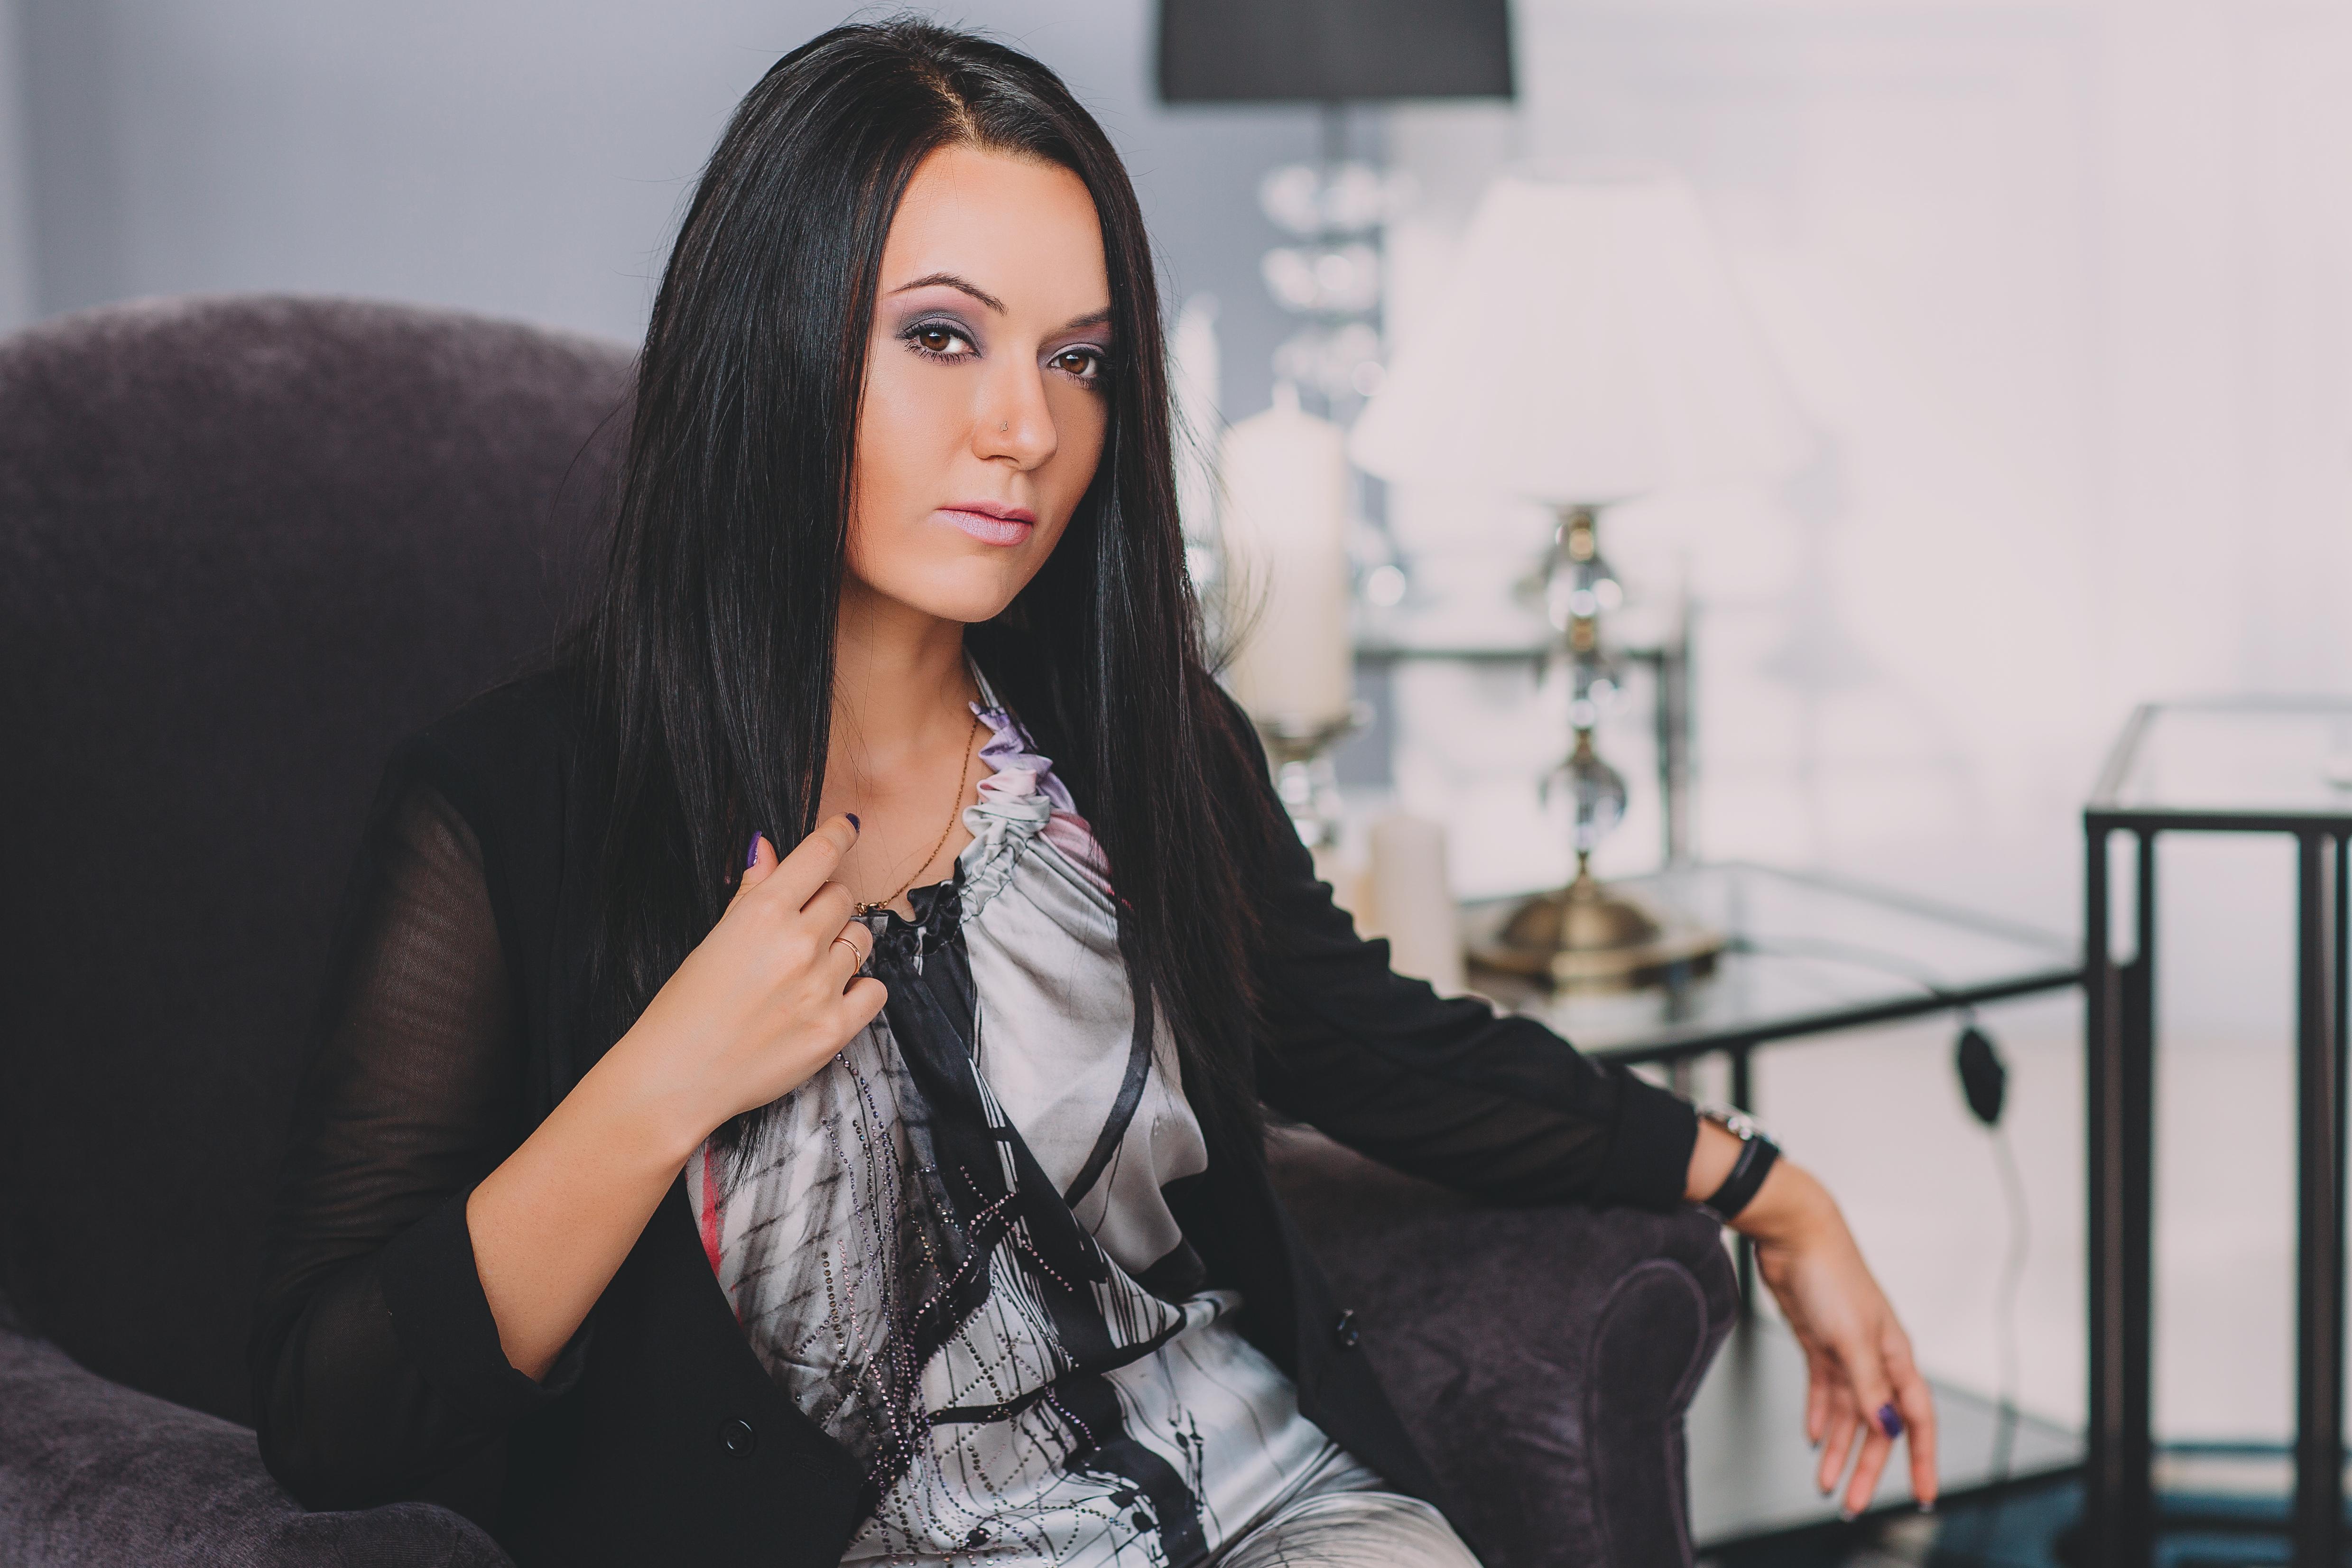 Психотерапевт Анна Морозова